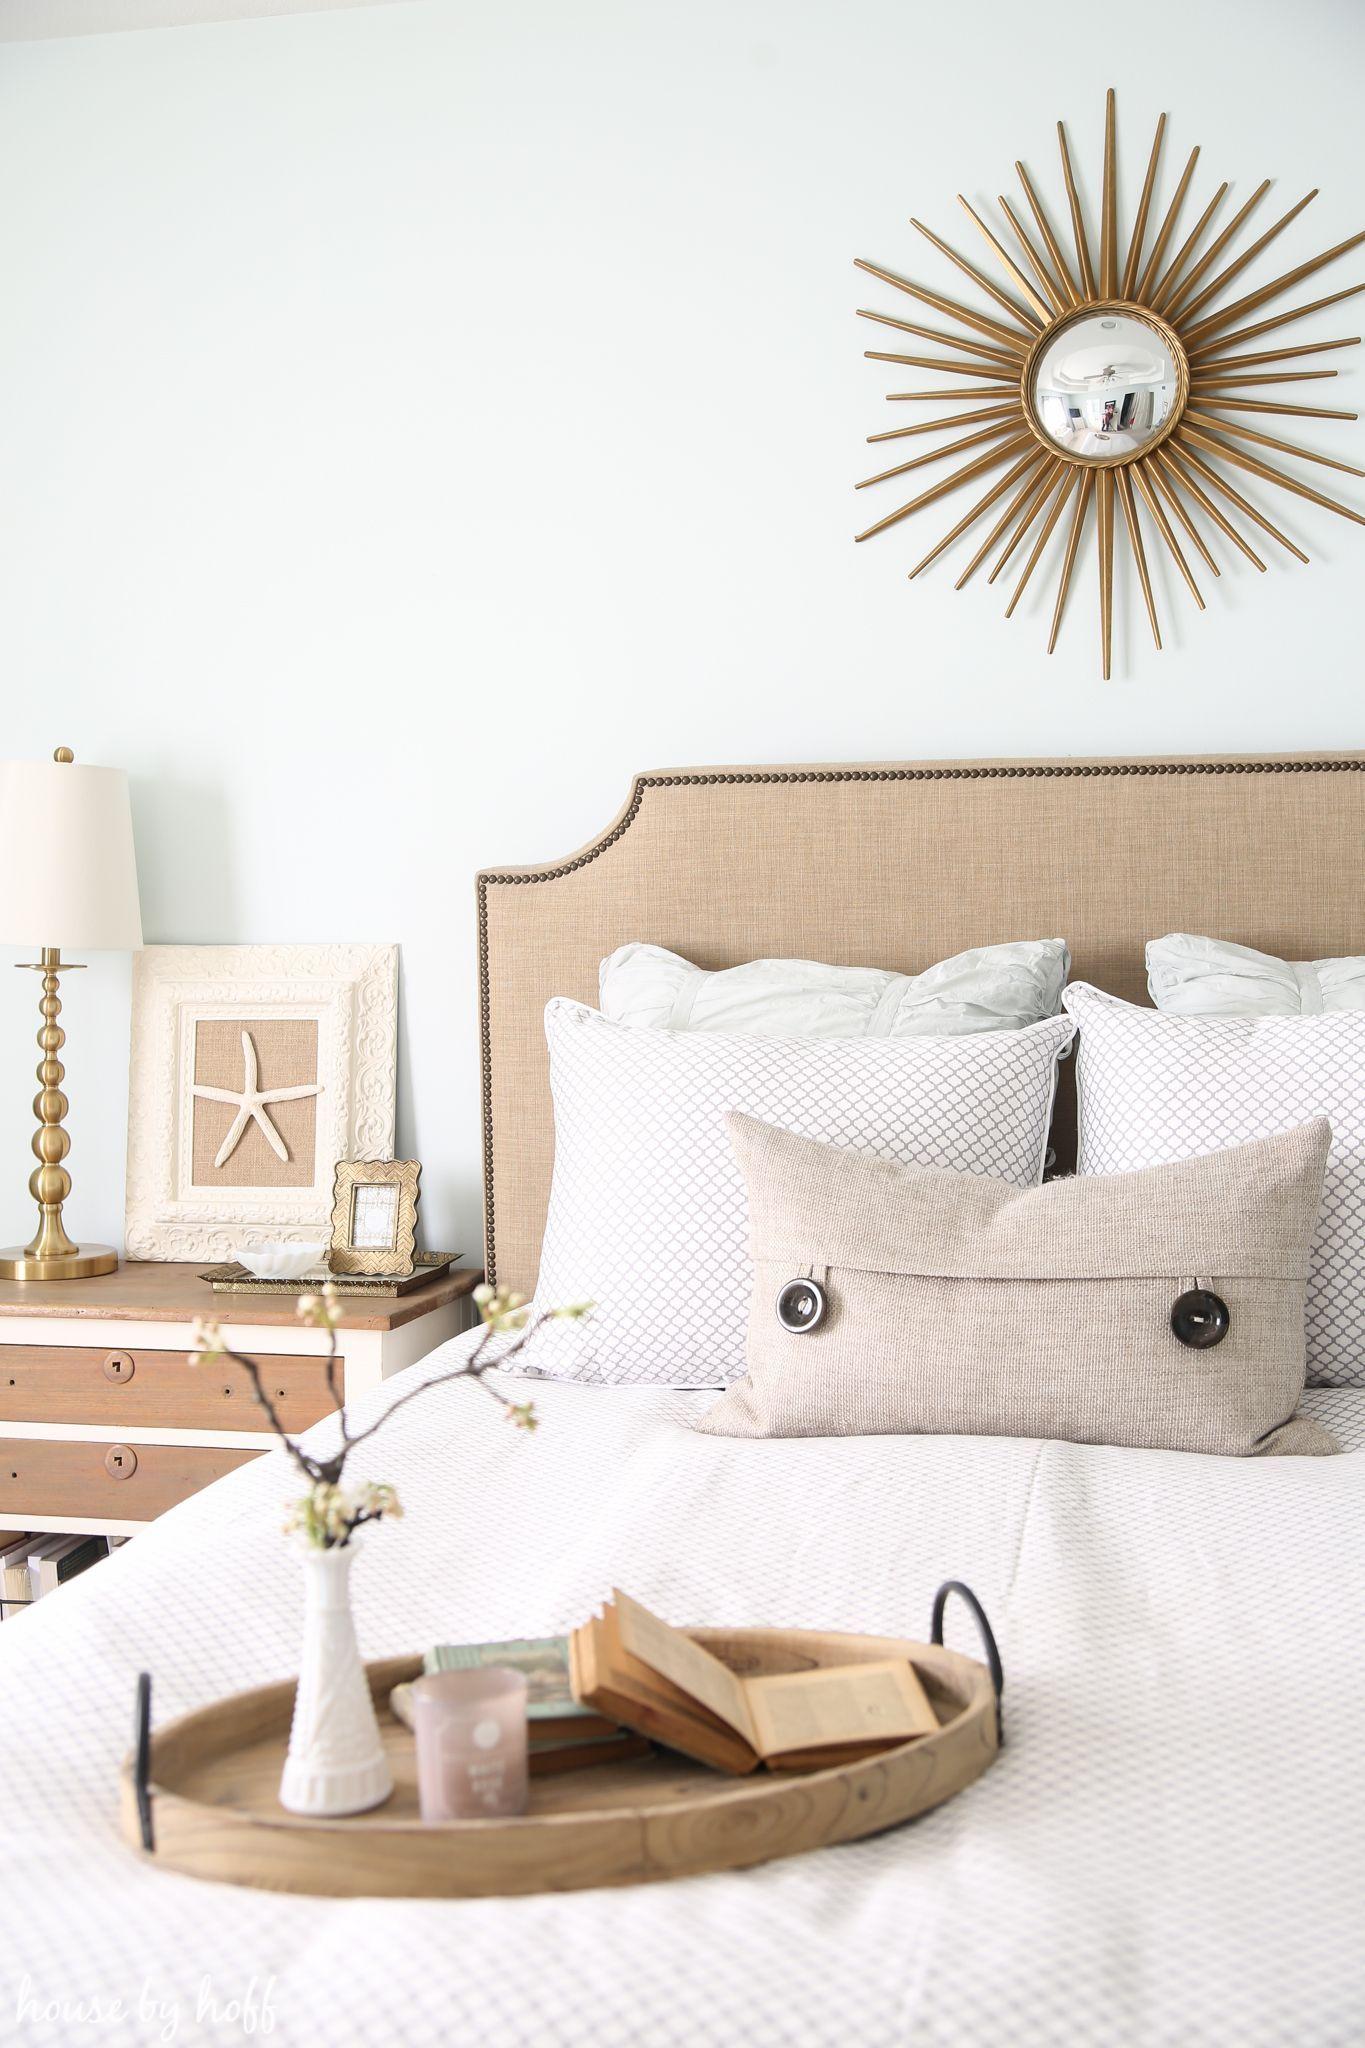 Master bedroom ideas   Master Bedroom Ideas That Go Beyond The Basics  Master bedroom